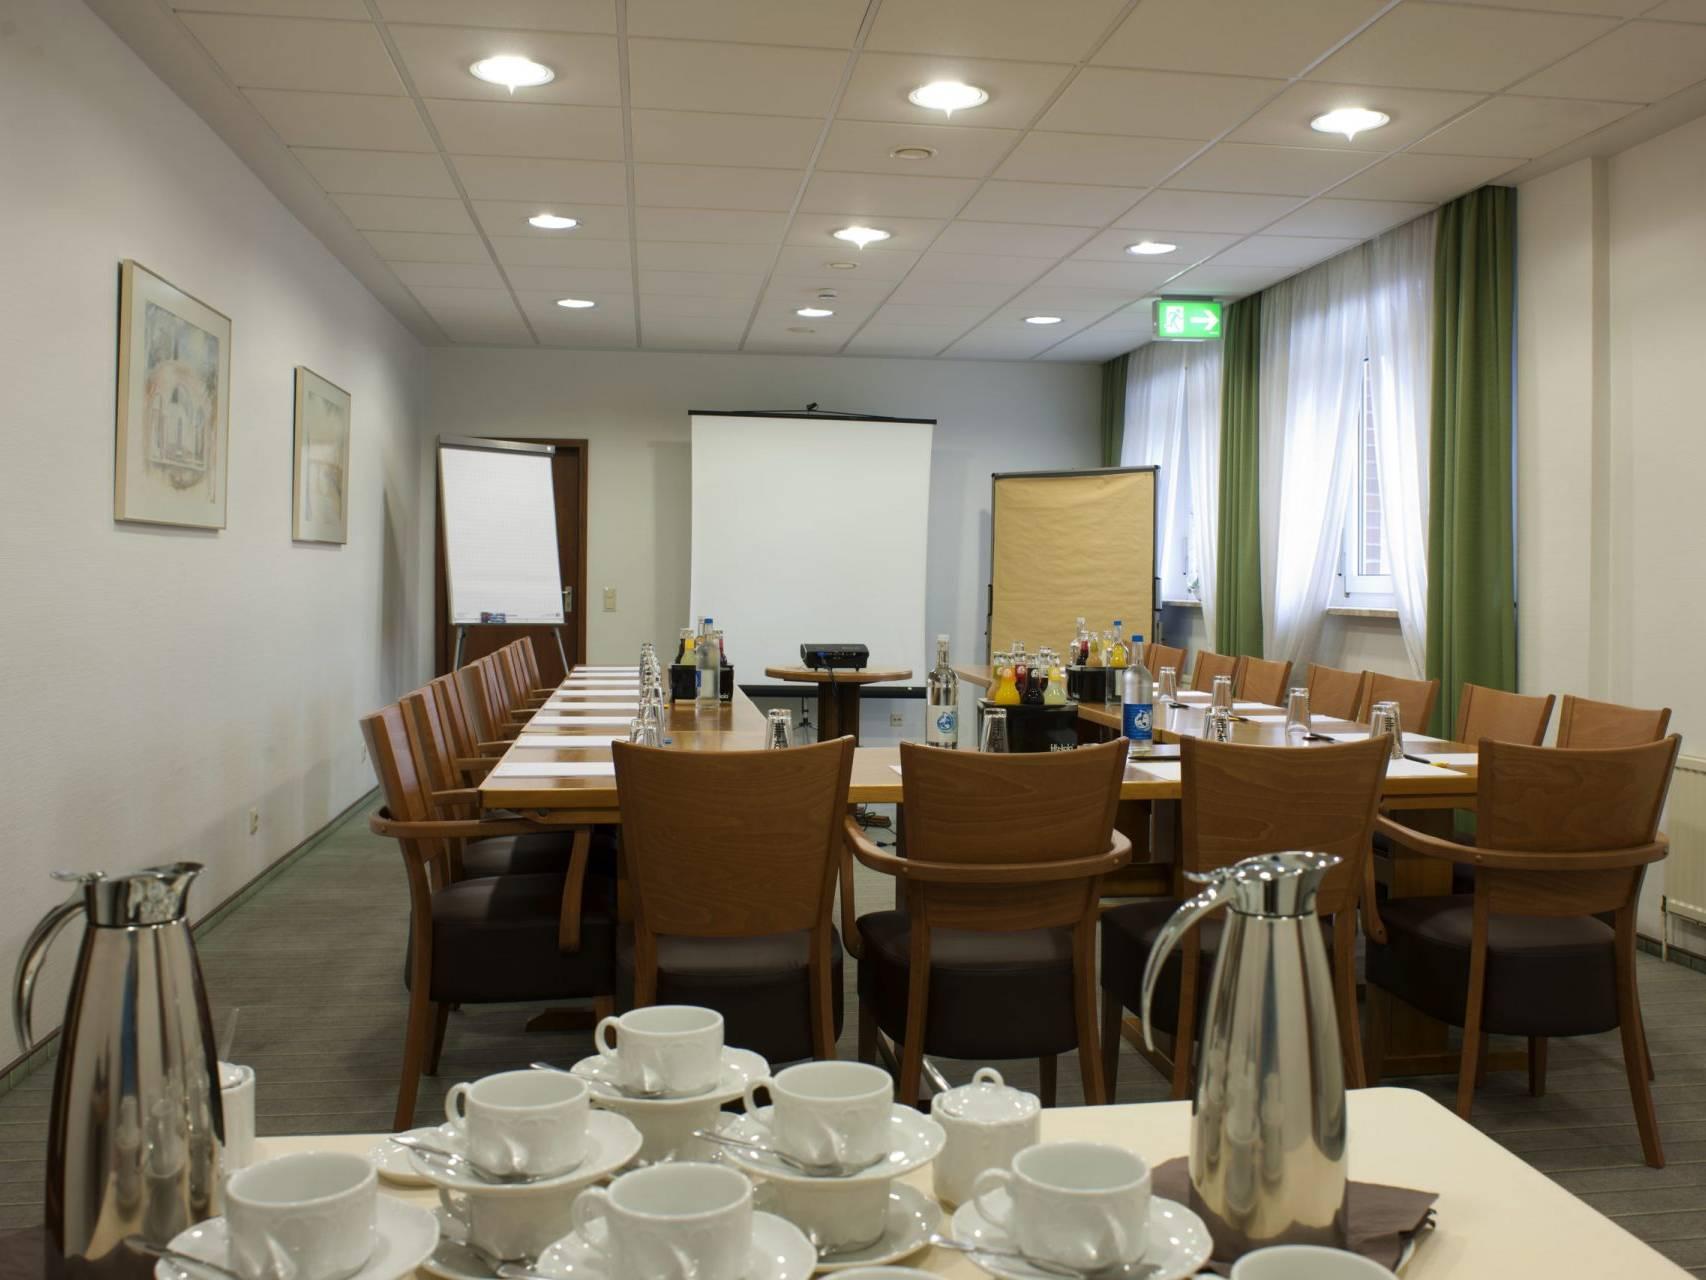 Konferenzraum Hotel am Stadtpark Buxtehude 1 scaled uai